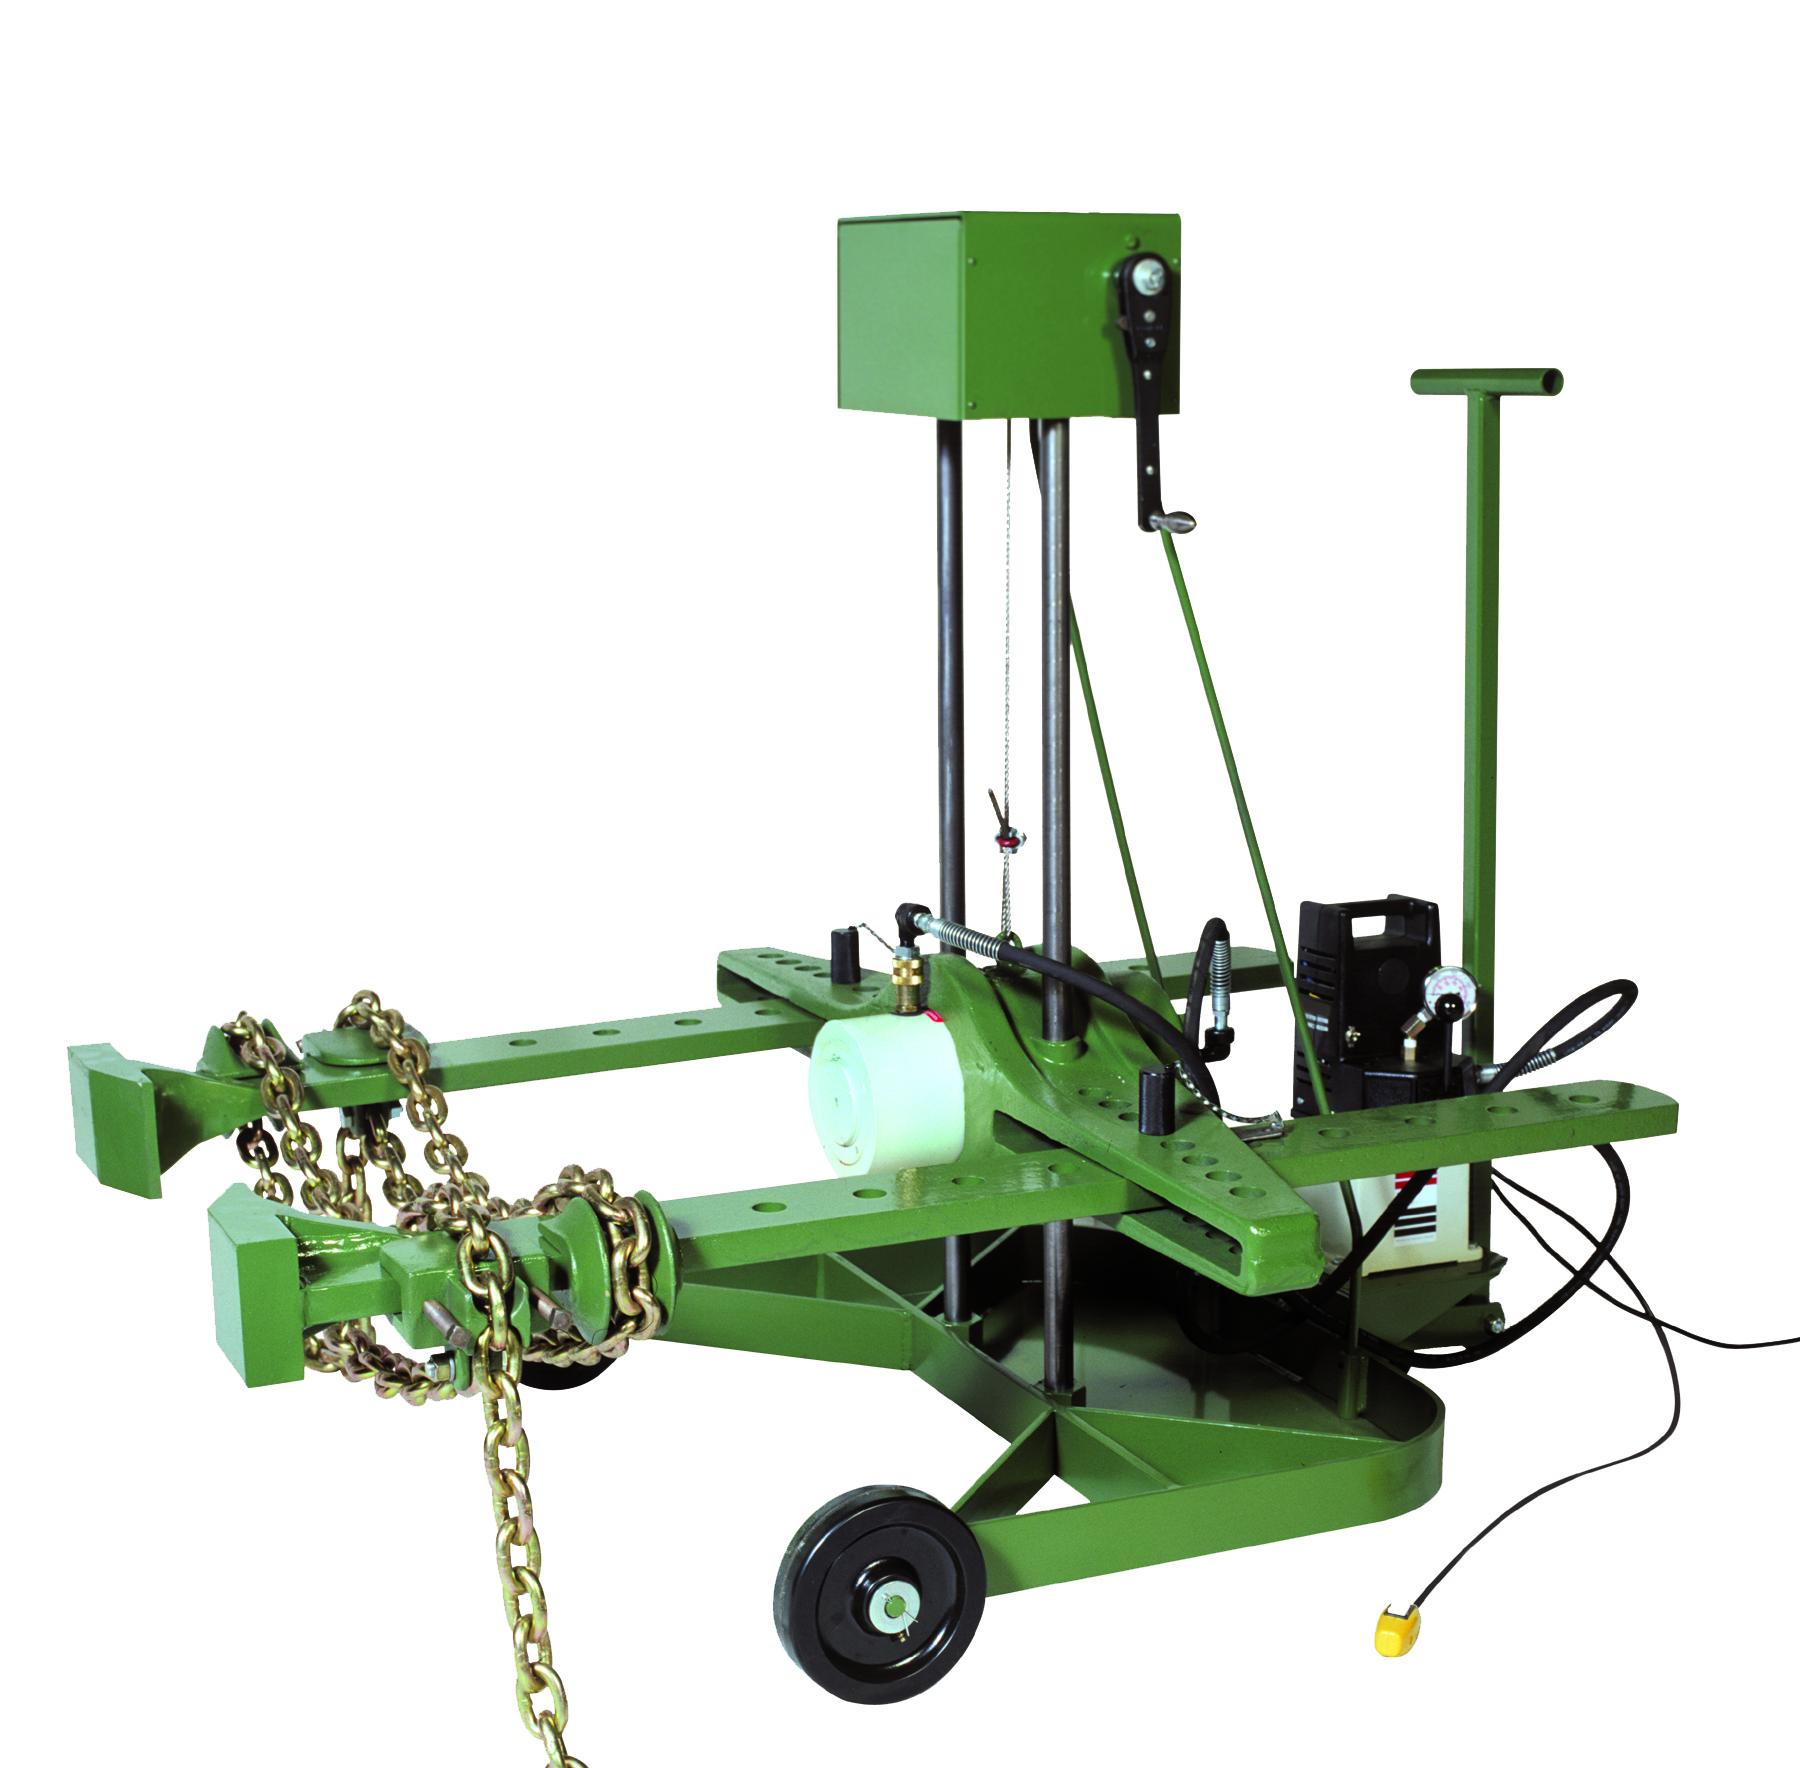 Electric Hydraulic Ram Cylinder Wiring Diagram Master Blogs Wheel Mount Units Industrial Pulley Puller Of Rebuild Repair